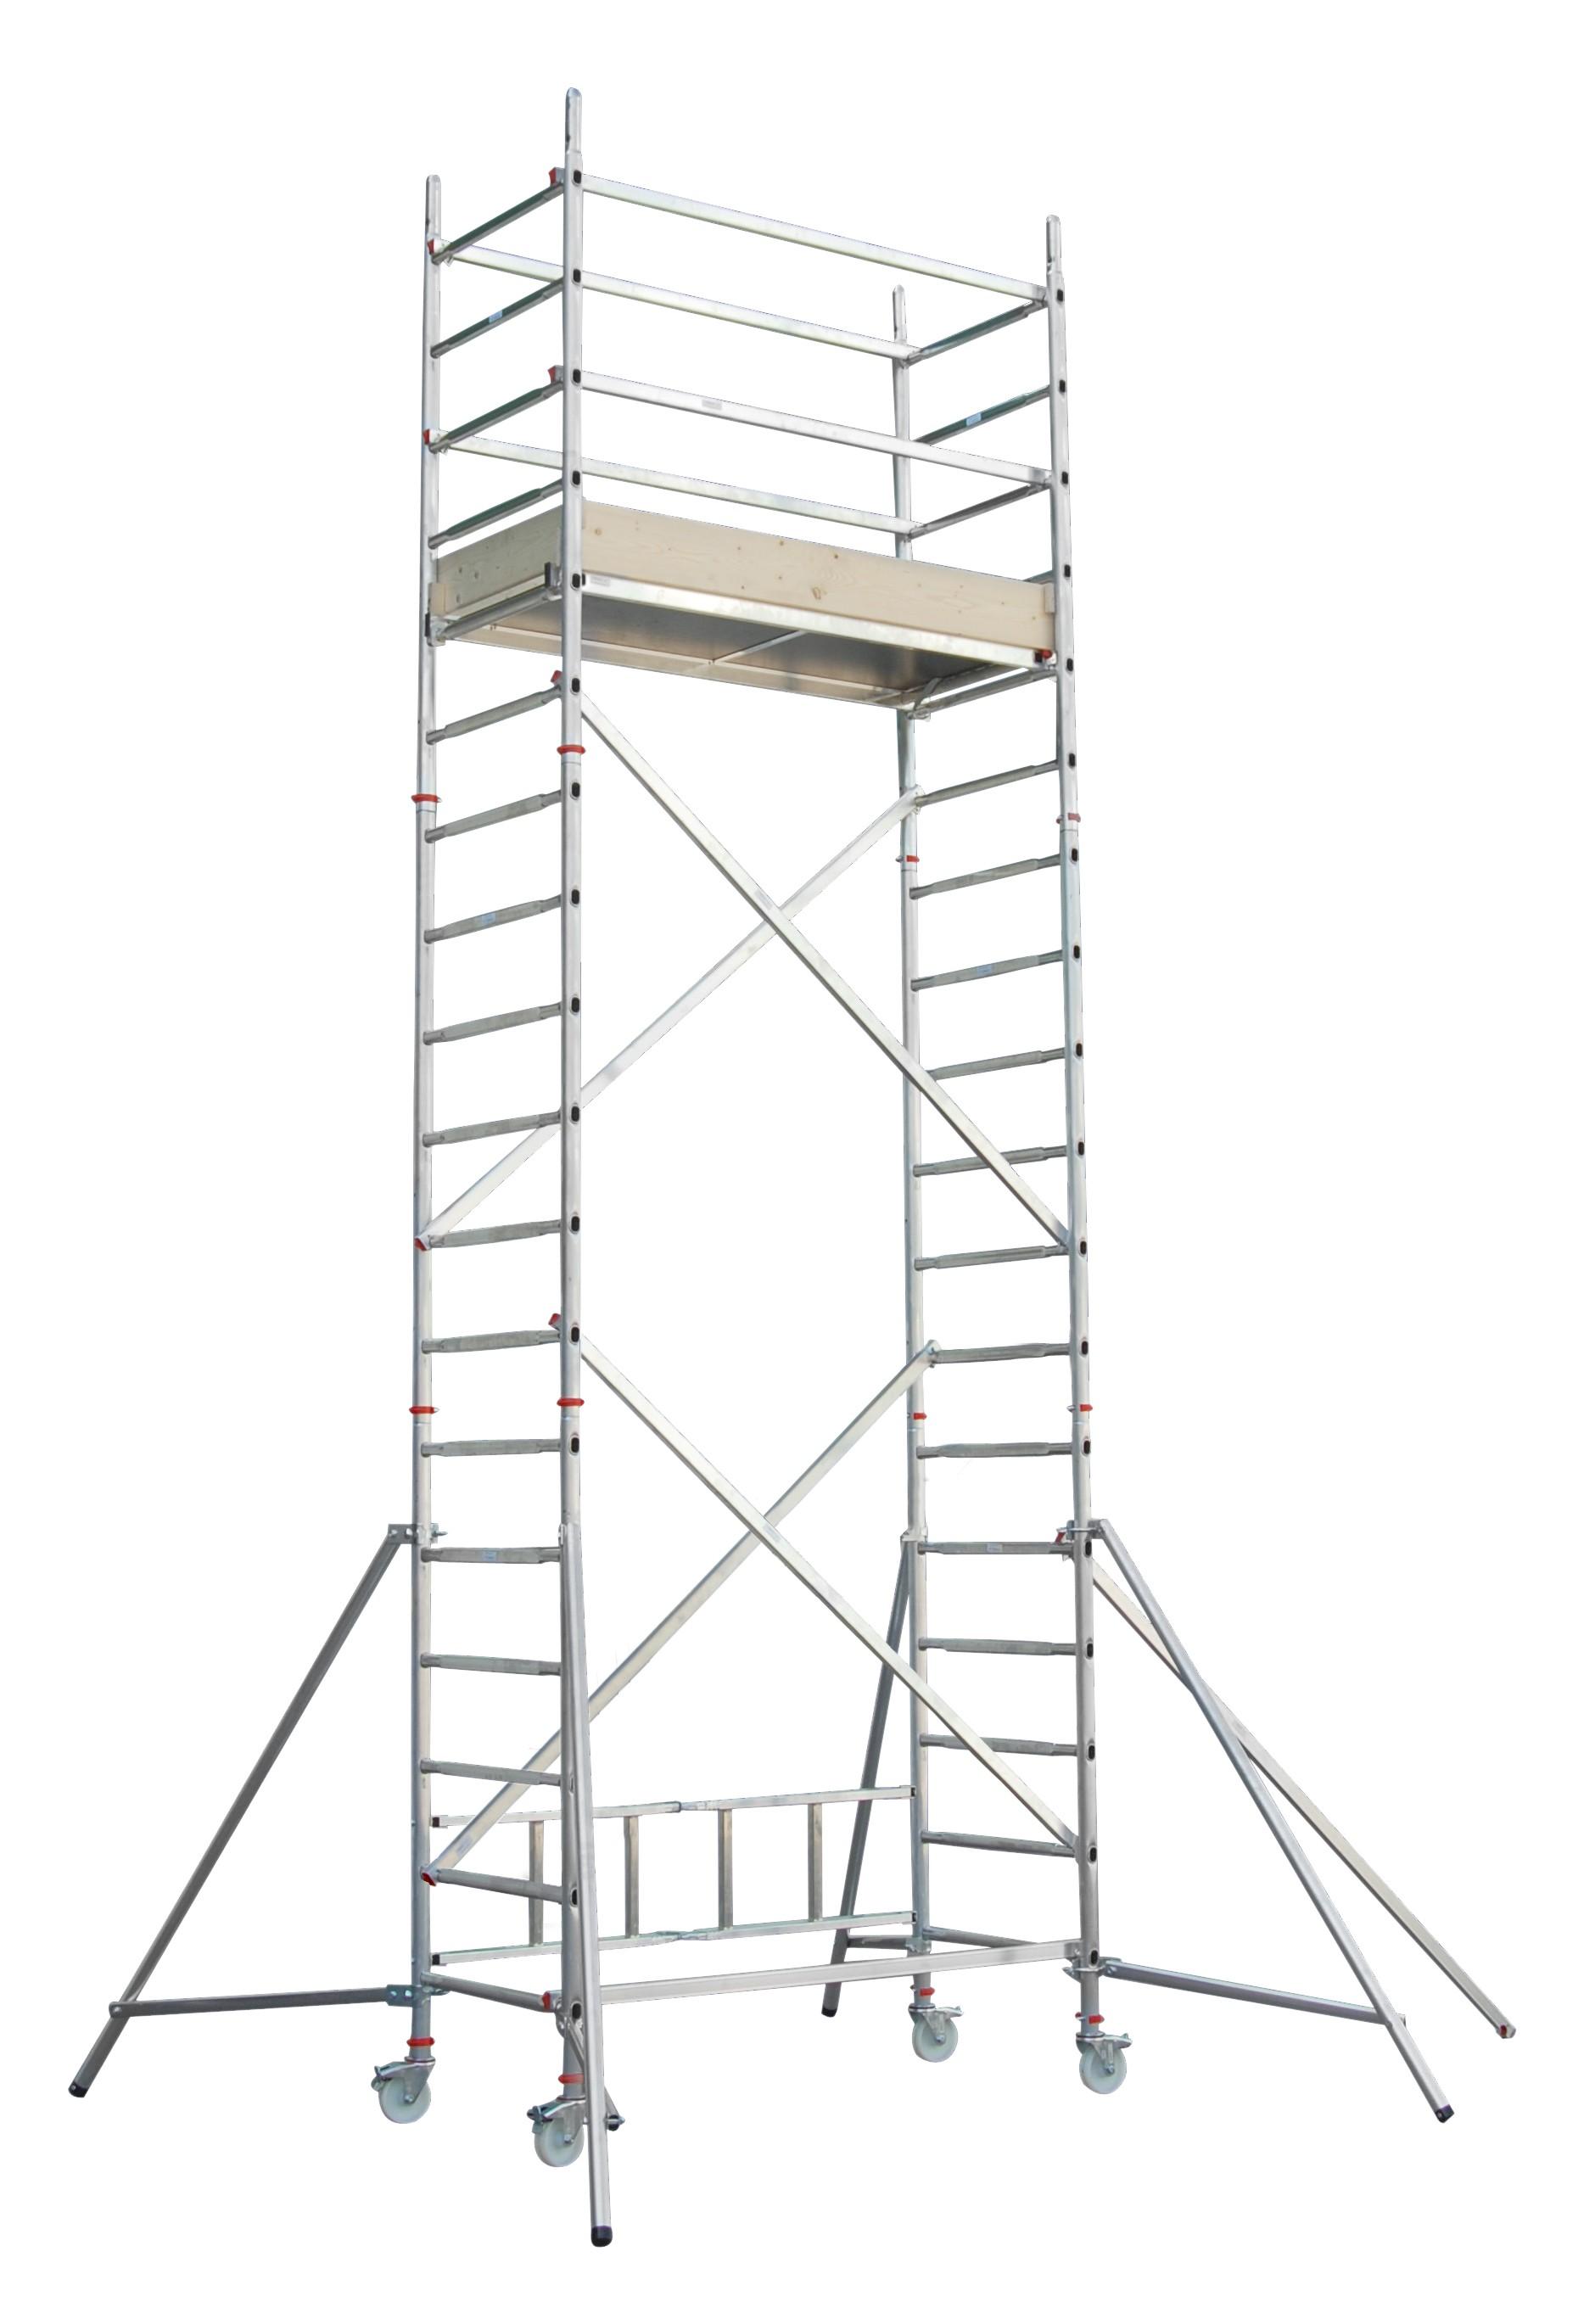 echafaudage 8 m pas cher best echafaudage roulant sc with. Black Bedroom Furniture Sets. Home Design Ideas